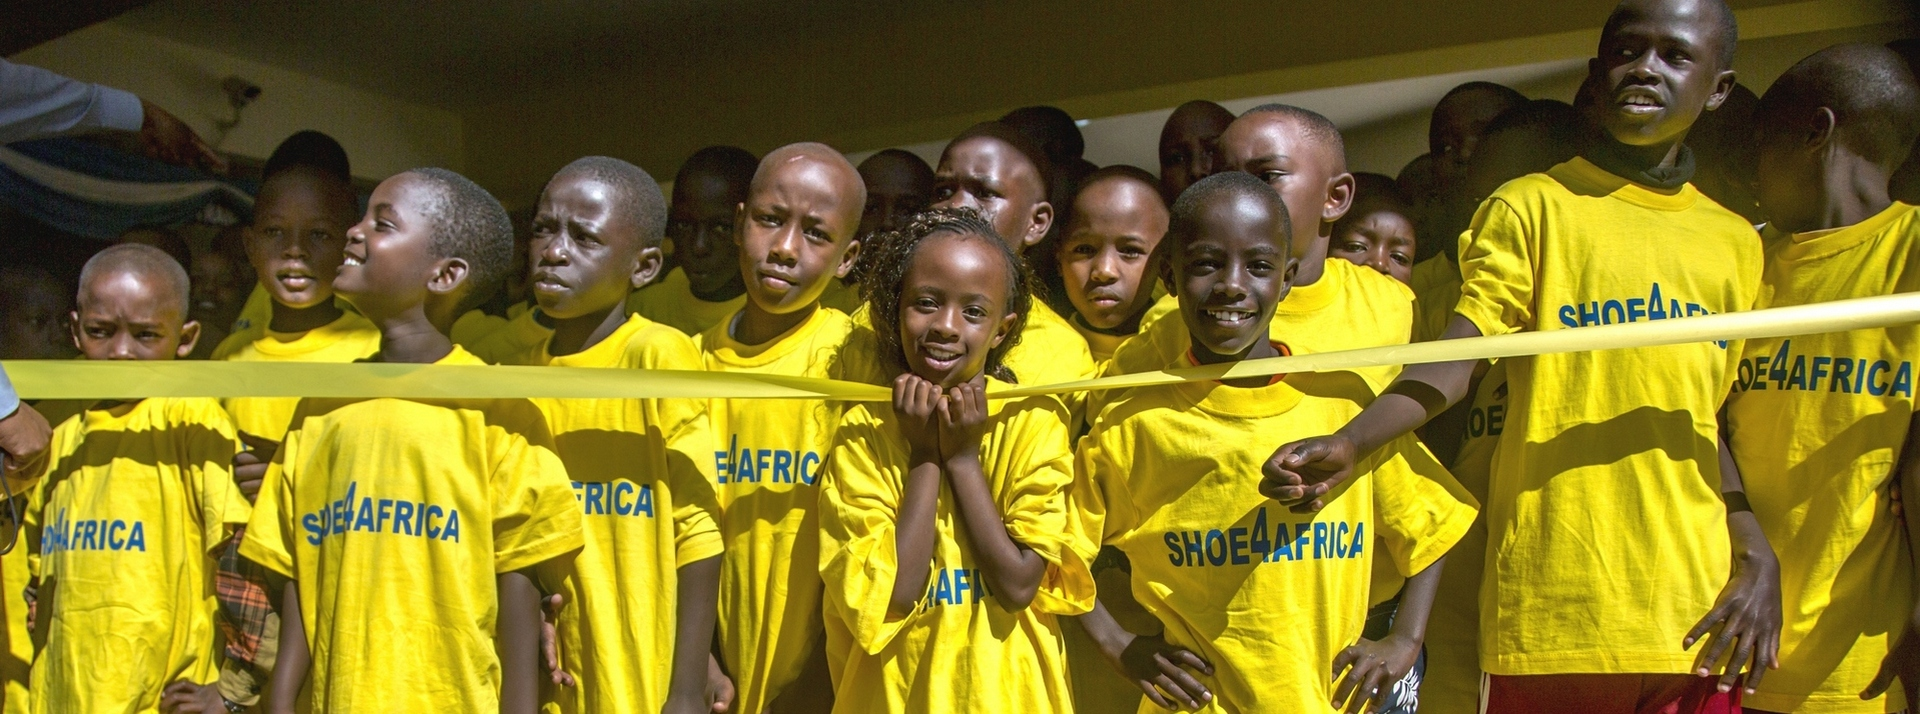 Educating Africa's future